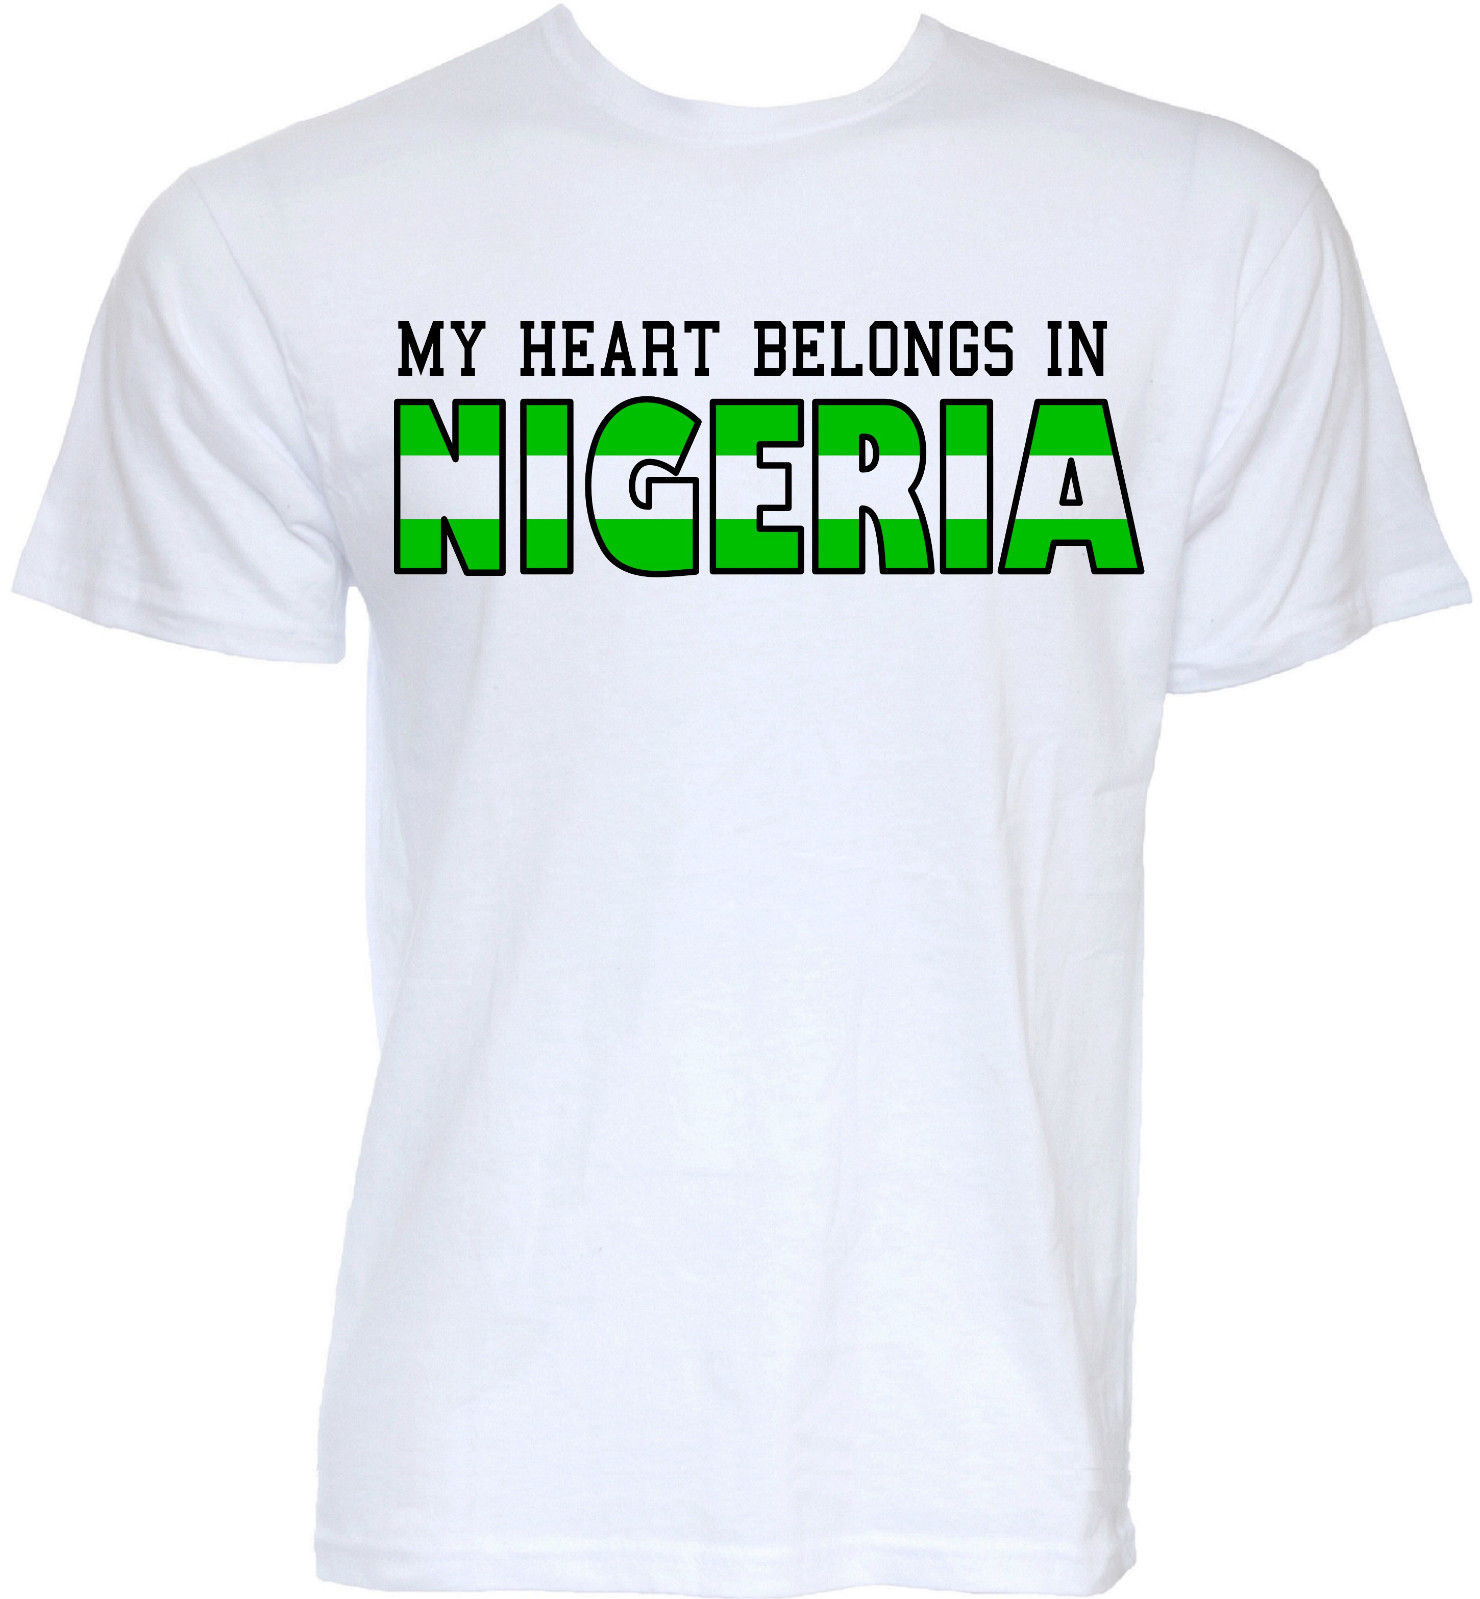 Shirt design in nigeria - Mens Funny Cool Novelty Nigeria Nigerian Flag Slogan T Shirts Joke Gifts T Shirt Print